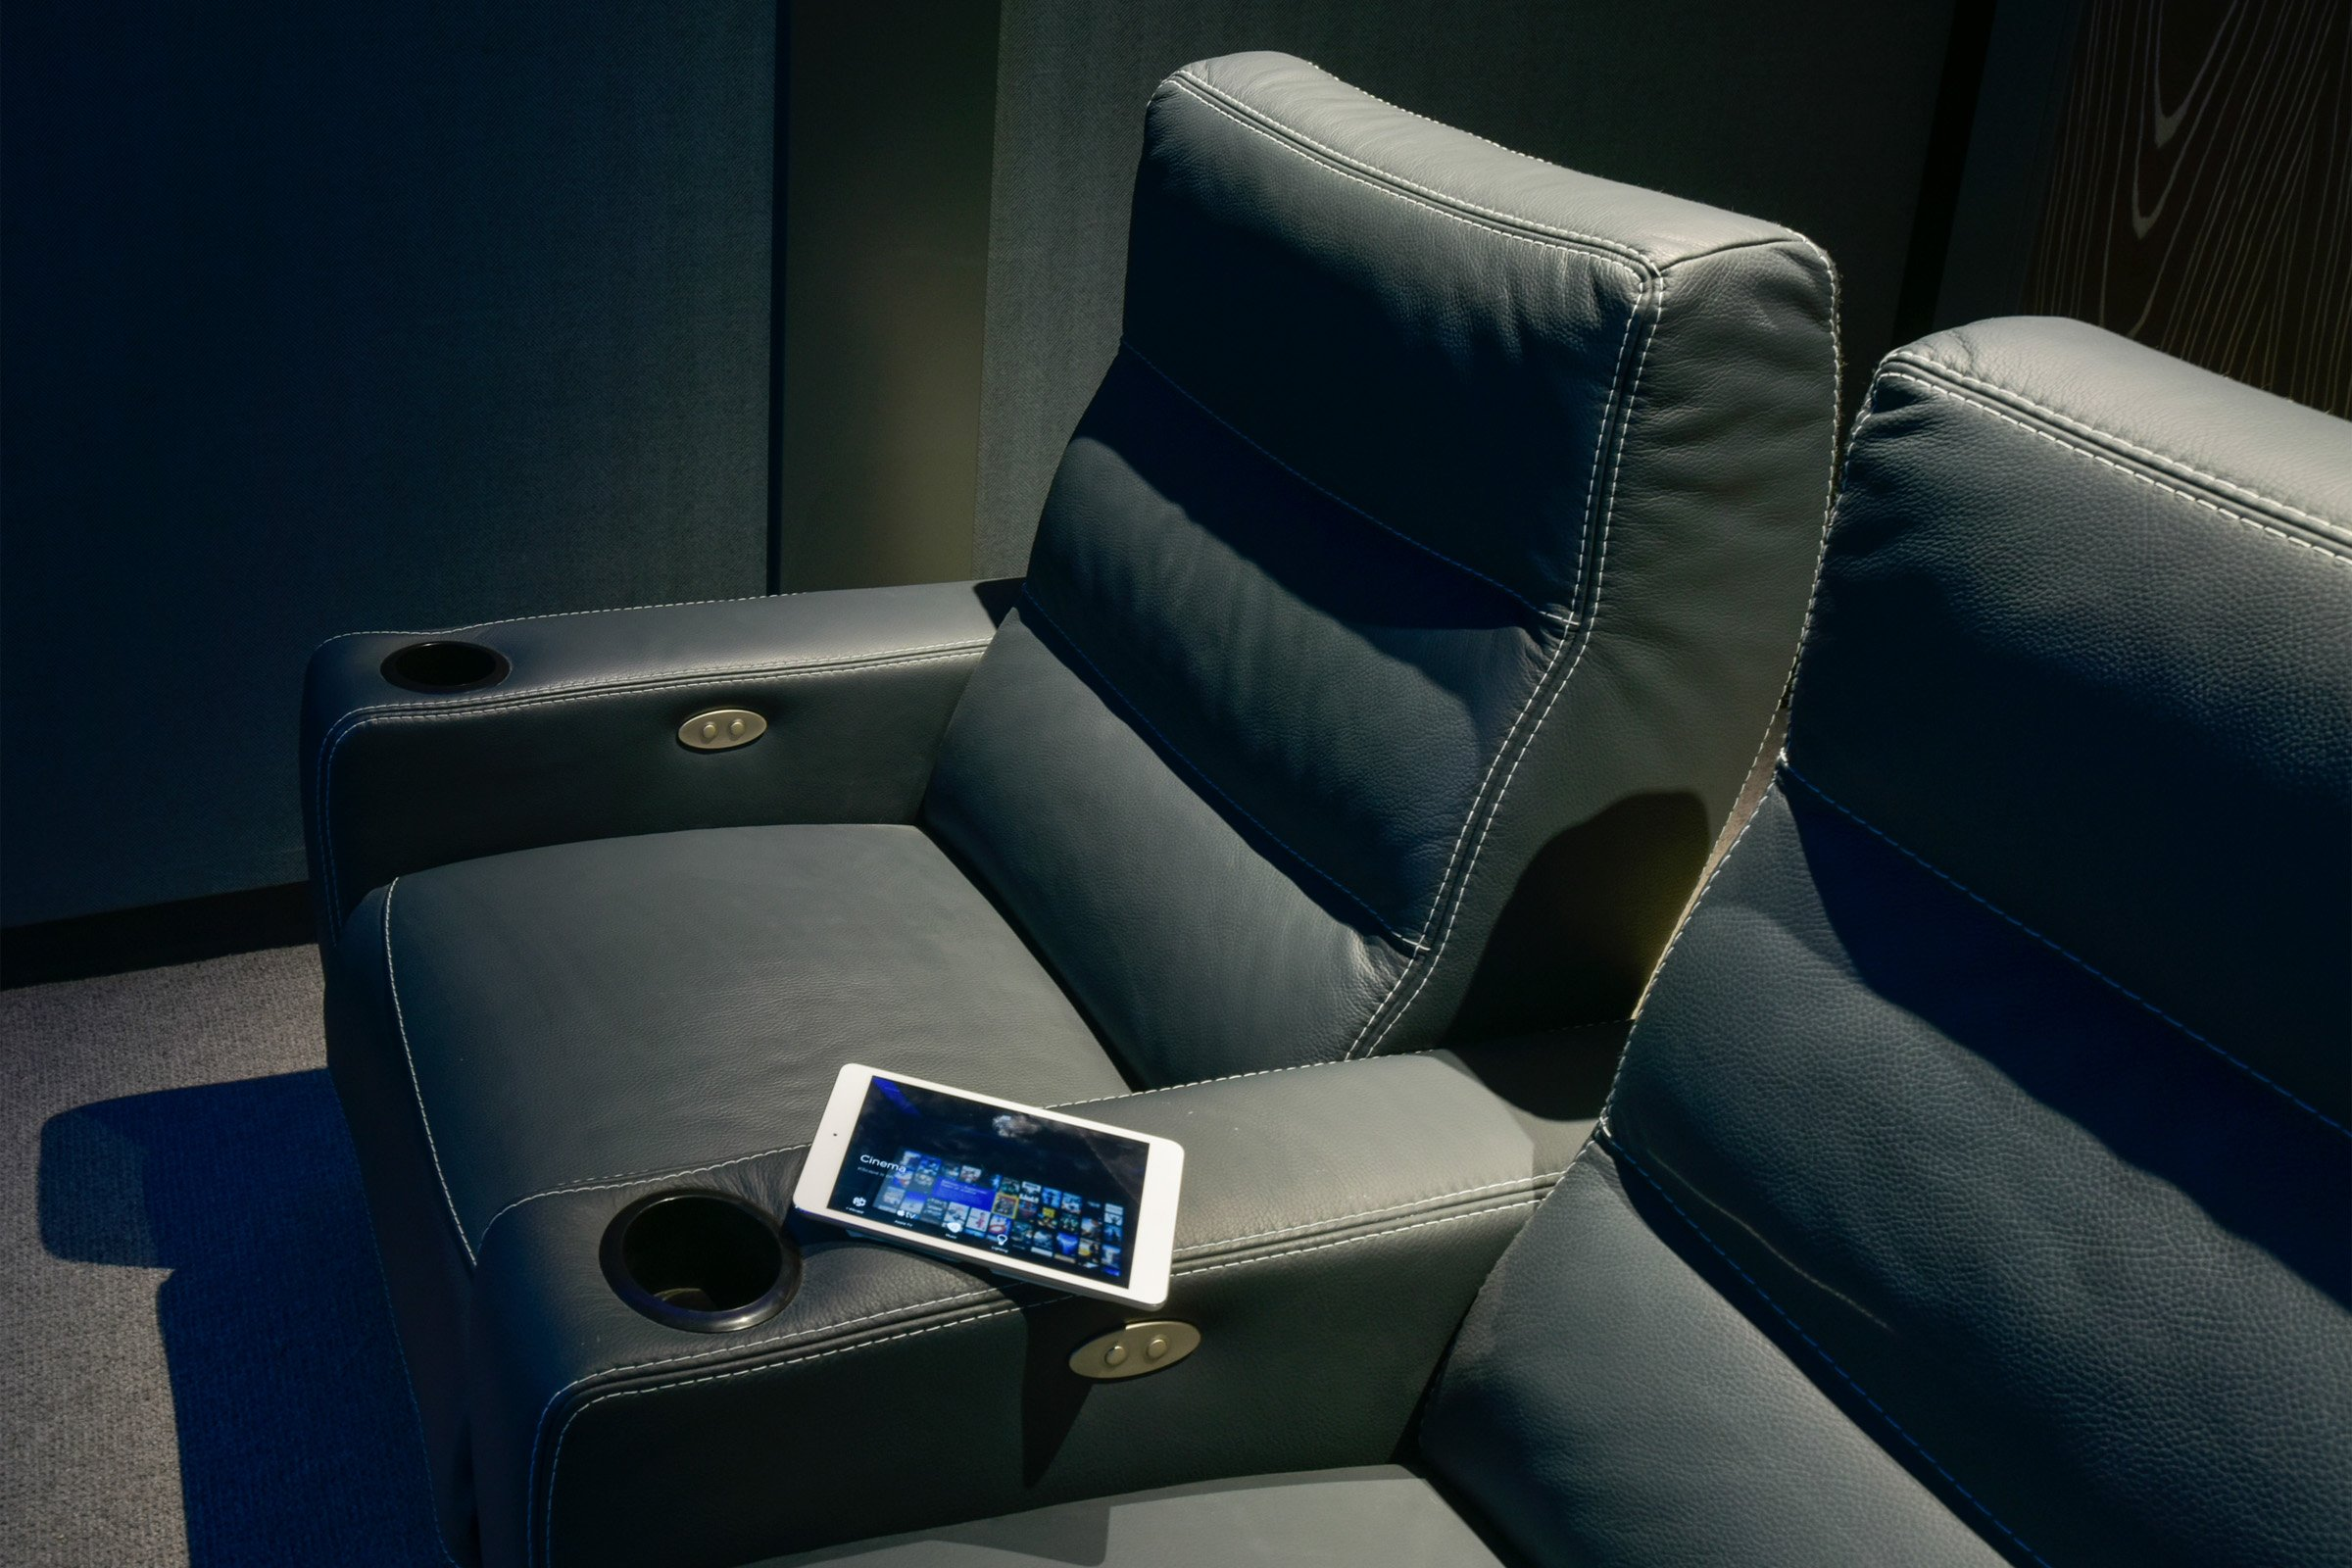 Colour matched bespoke cinema seats